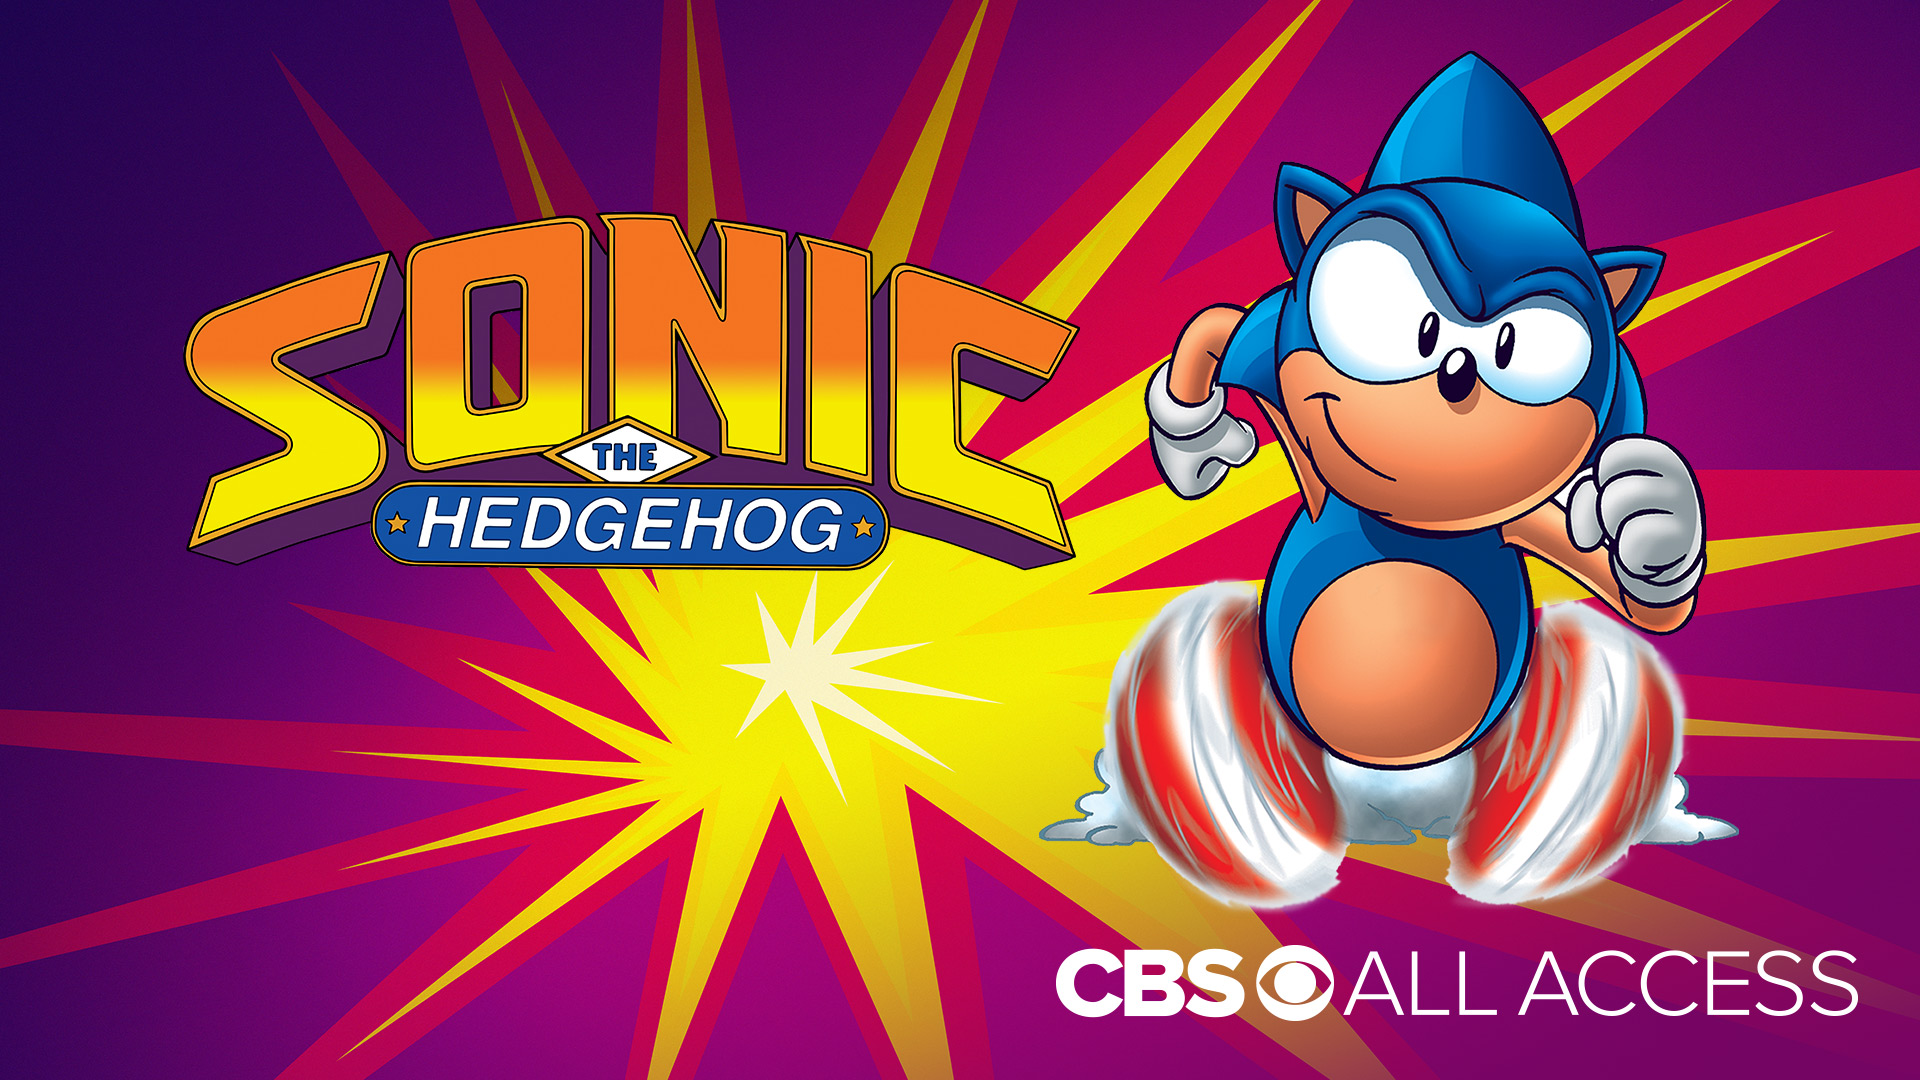 Sonic The Hedgehog Season 1